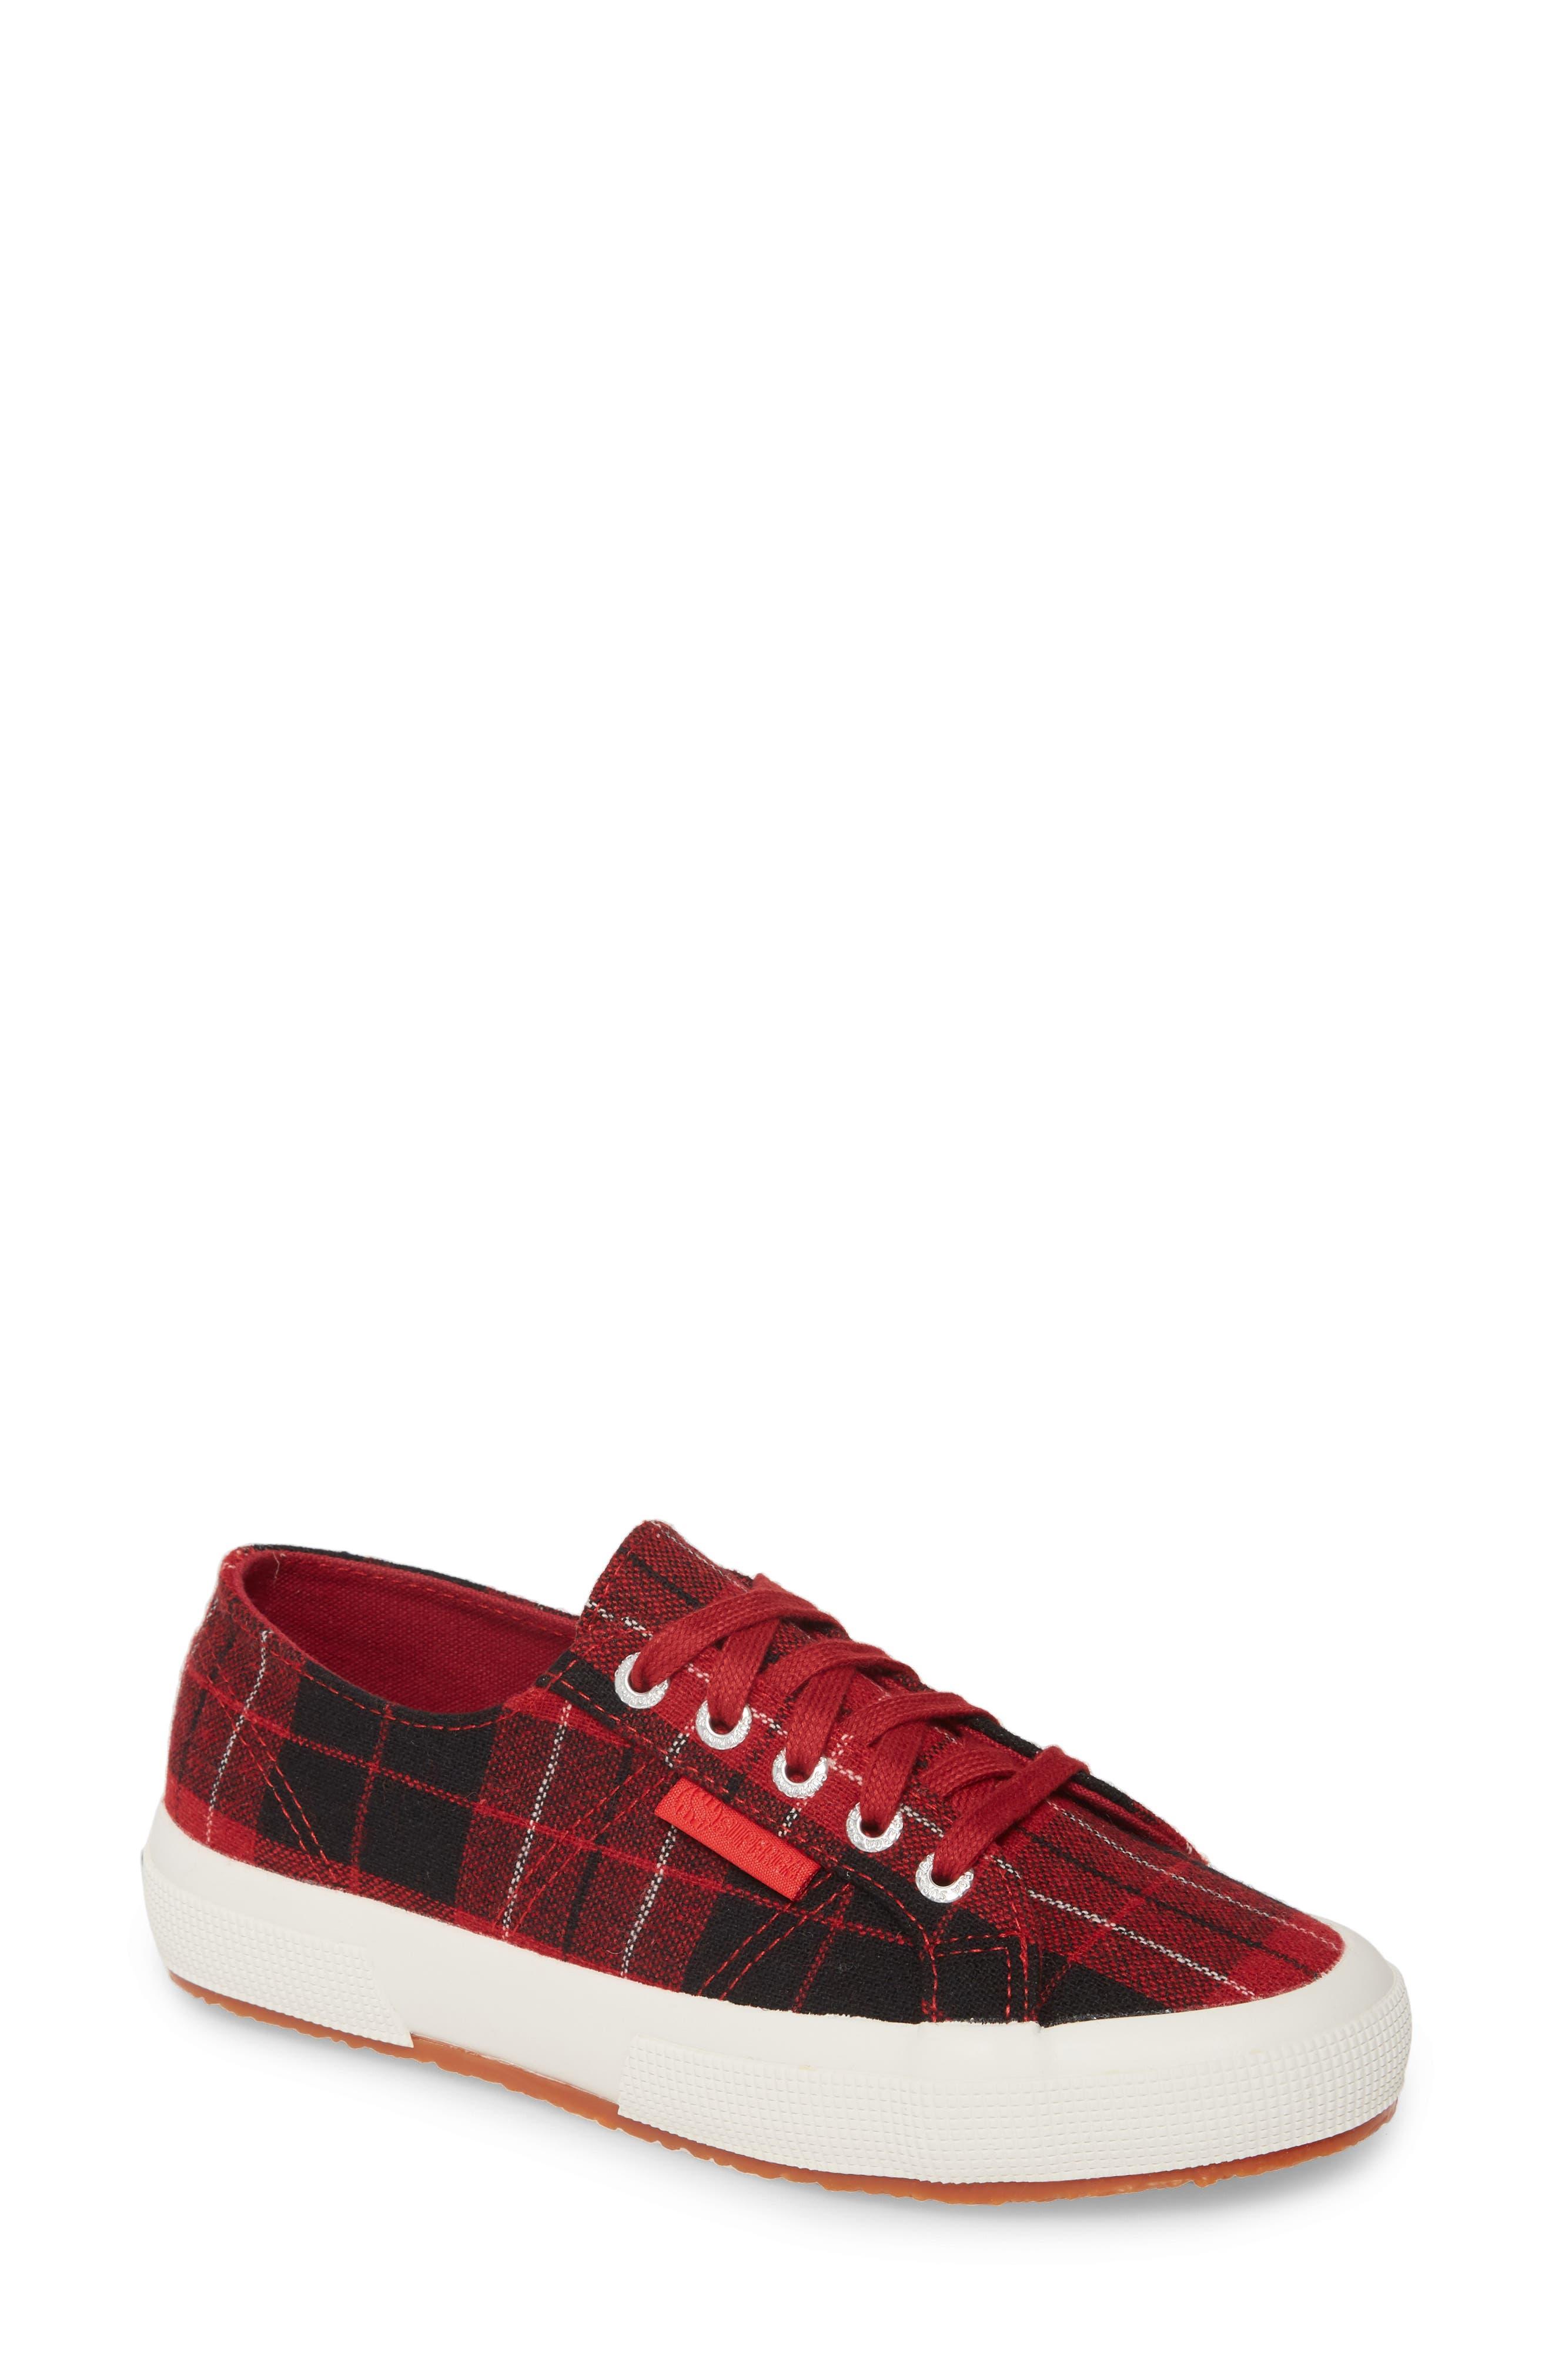 Superga 2750 Woolplaidw Sneaker (Women